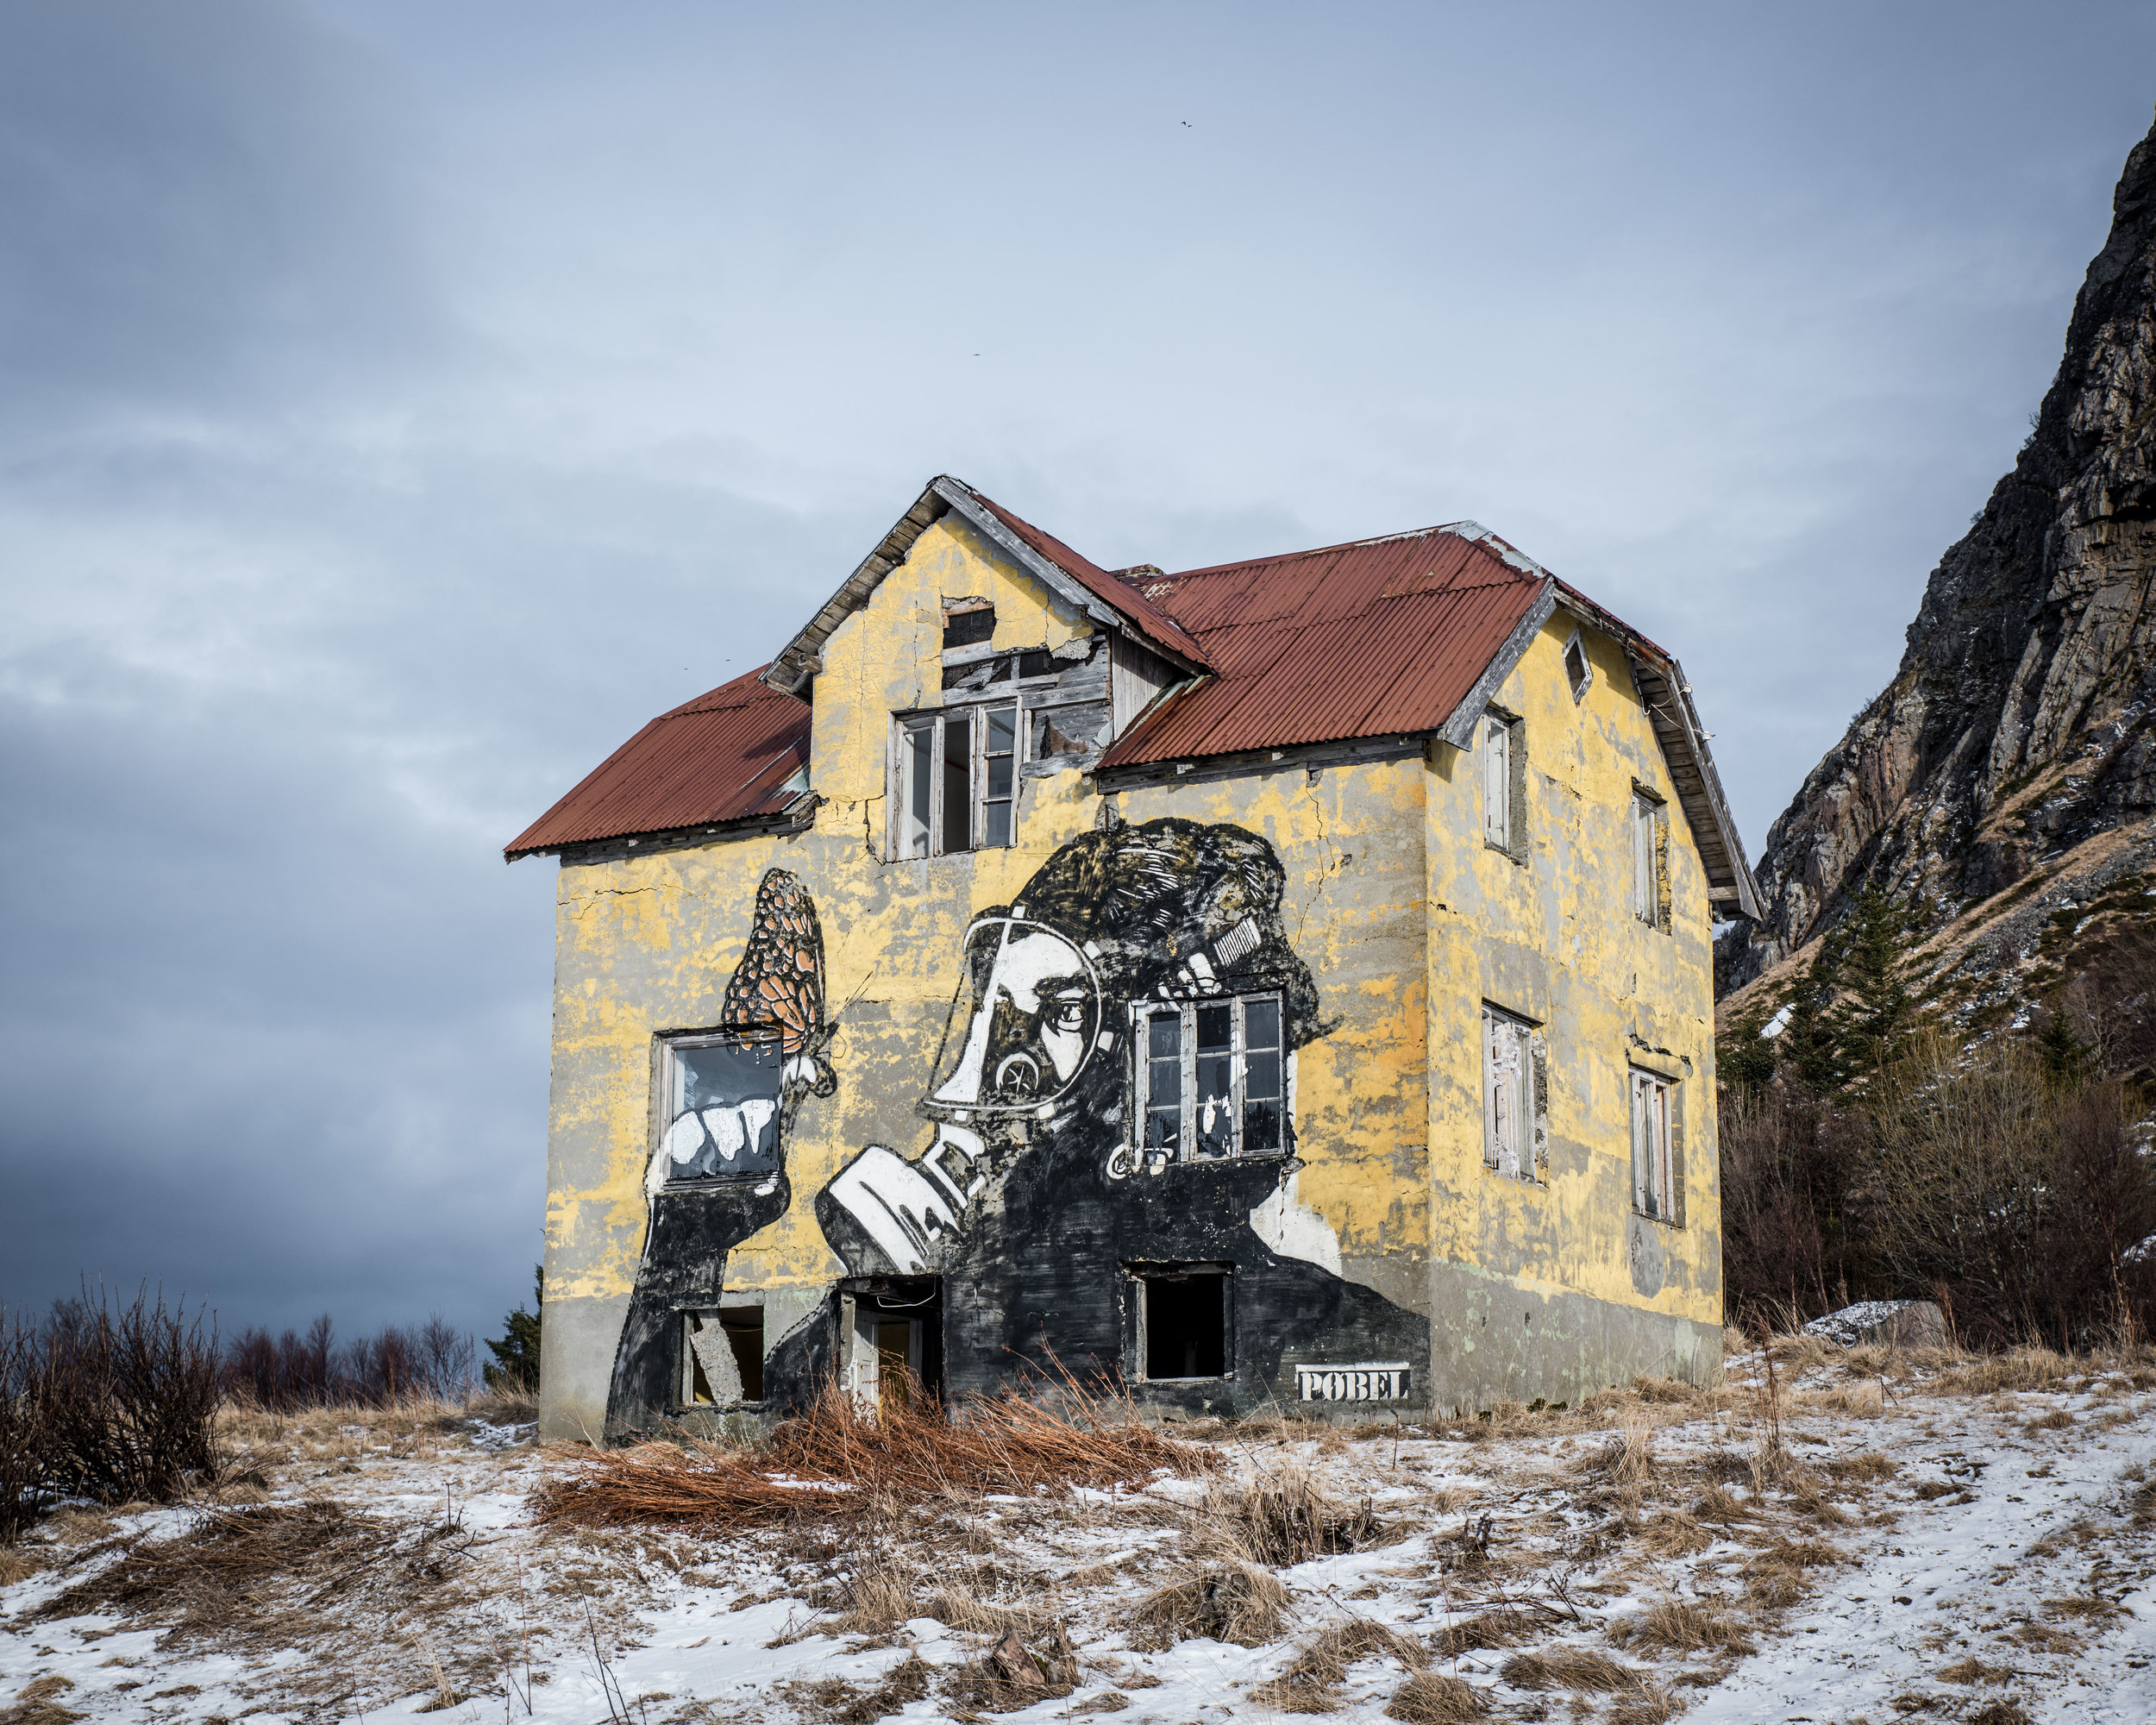 PF 7 Graffiti - 1.jpg